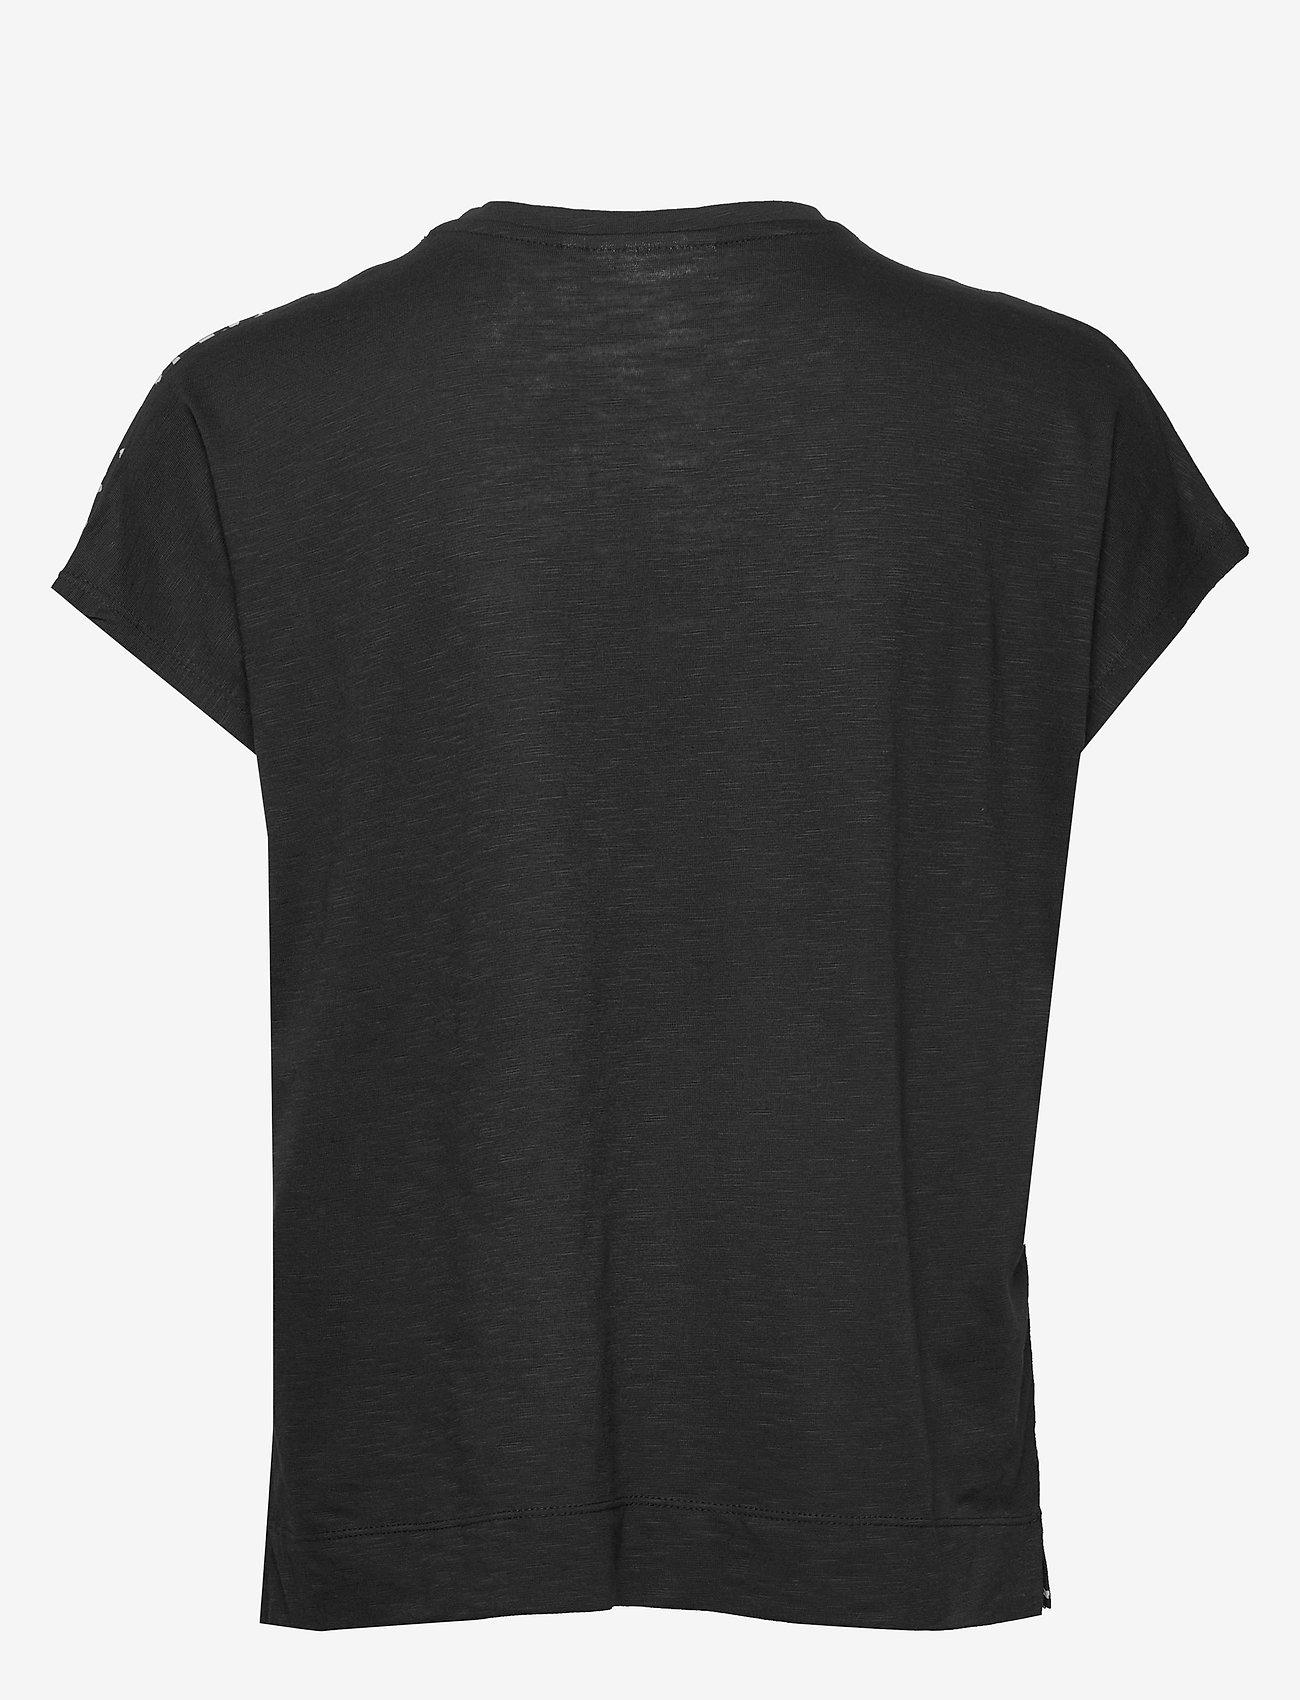 InWear Sicily V T-Shirt - T-shirts & topper BLACK WINDY DOTS - Dameklær Spesialtilbud